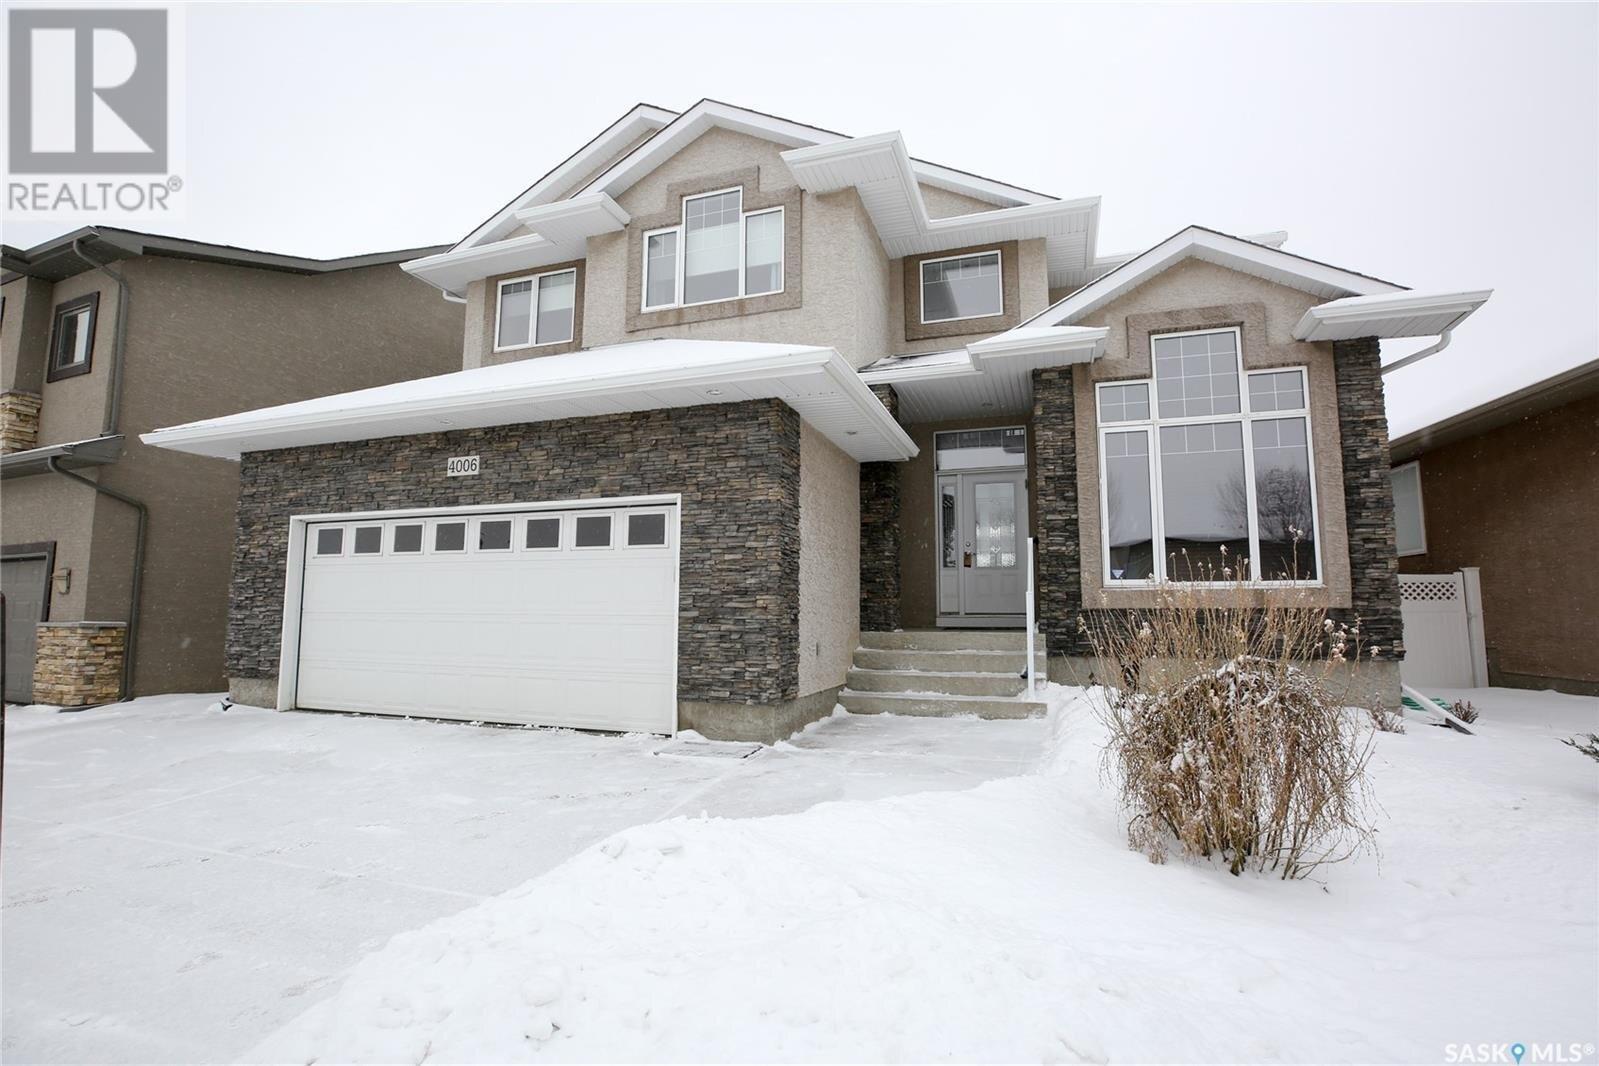 House for sale at 4006 Goldfinch Wy Regina Saskatchewan - MLS: SK834270